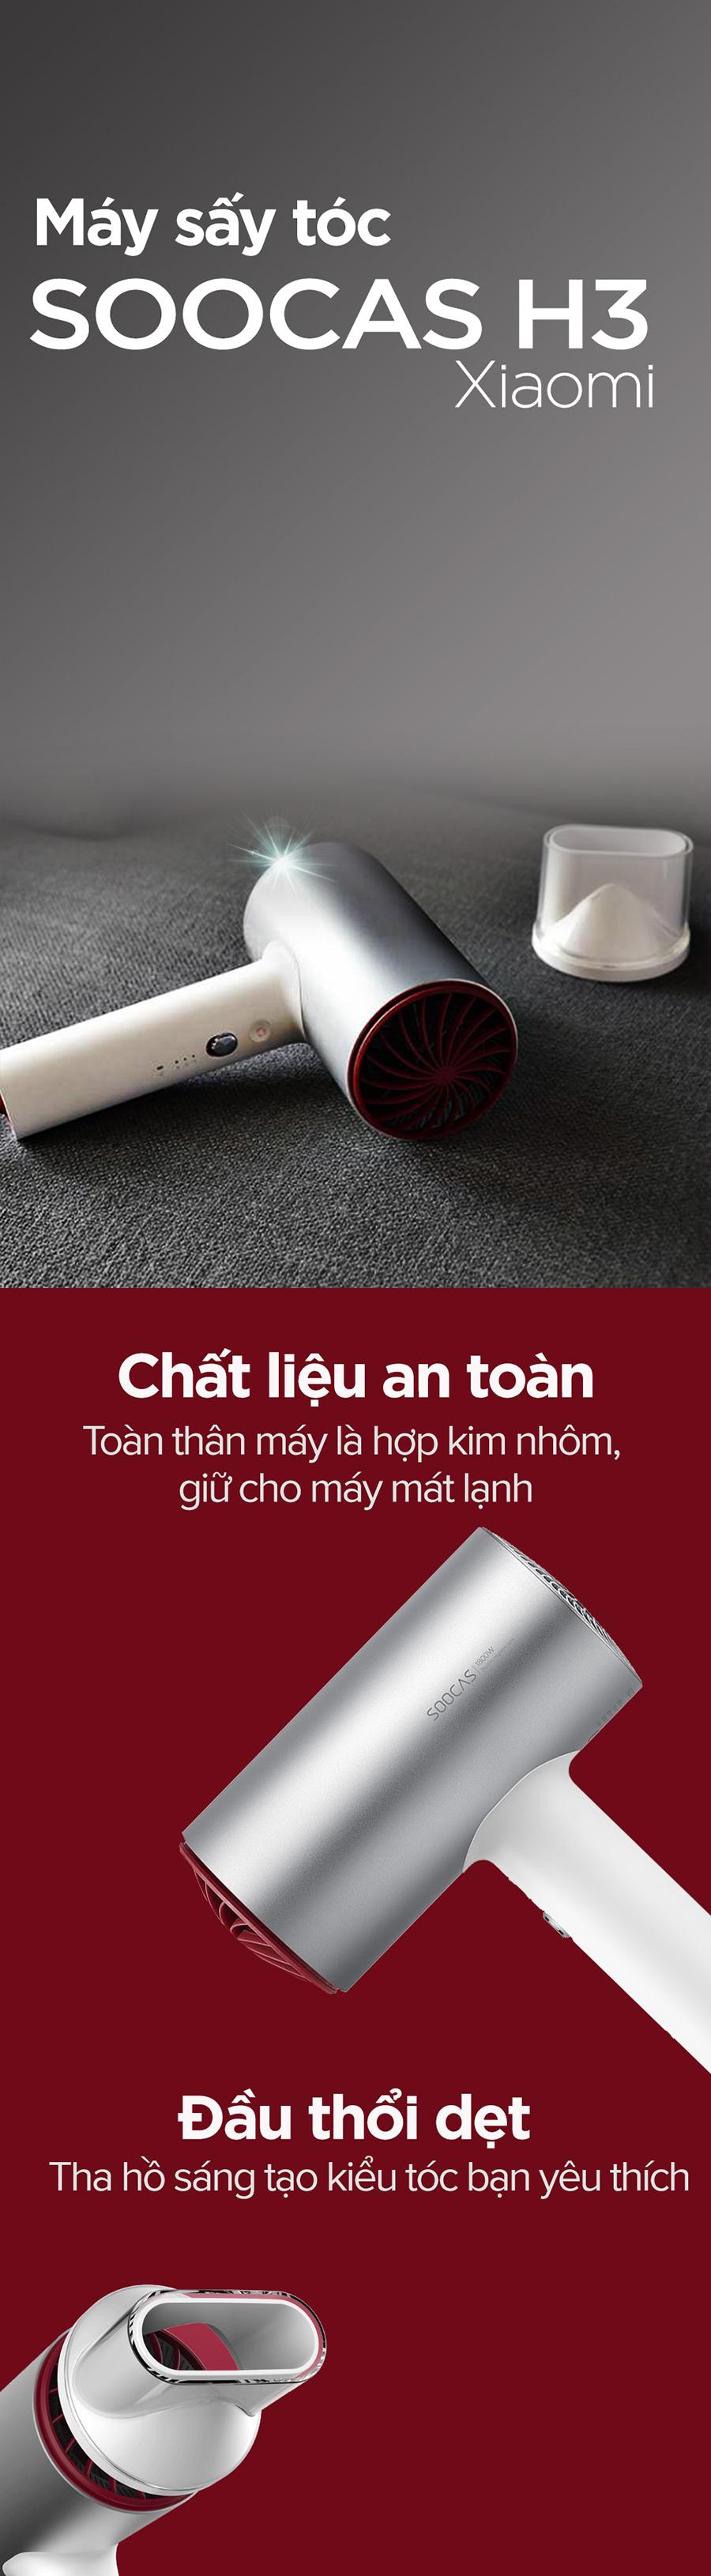 Máy sấy tóc Xiaomi Soocas H3 1800W